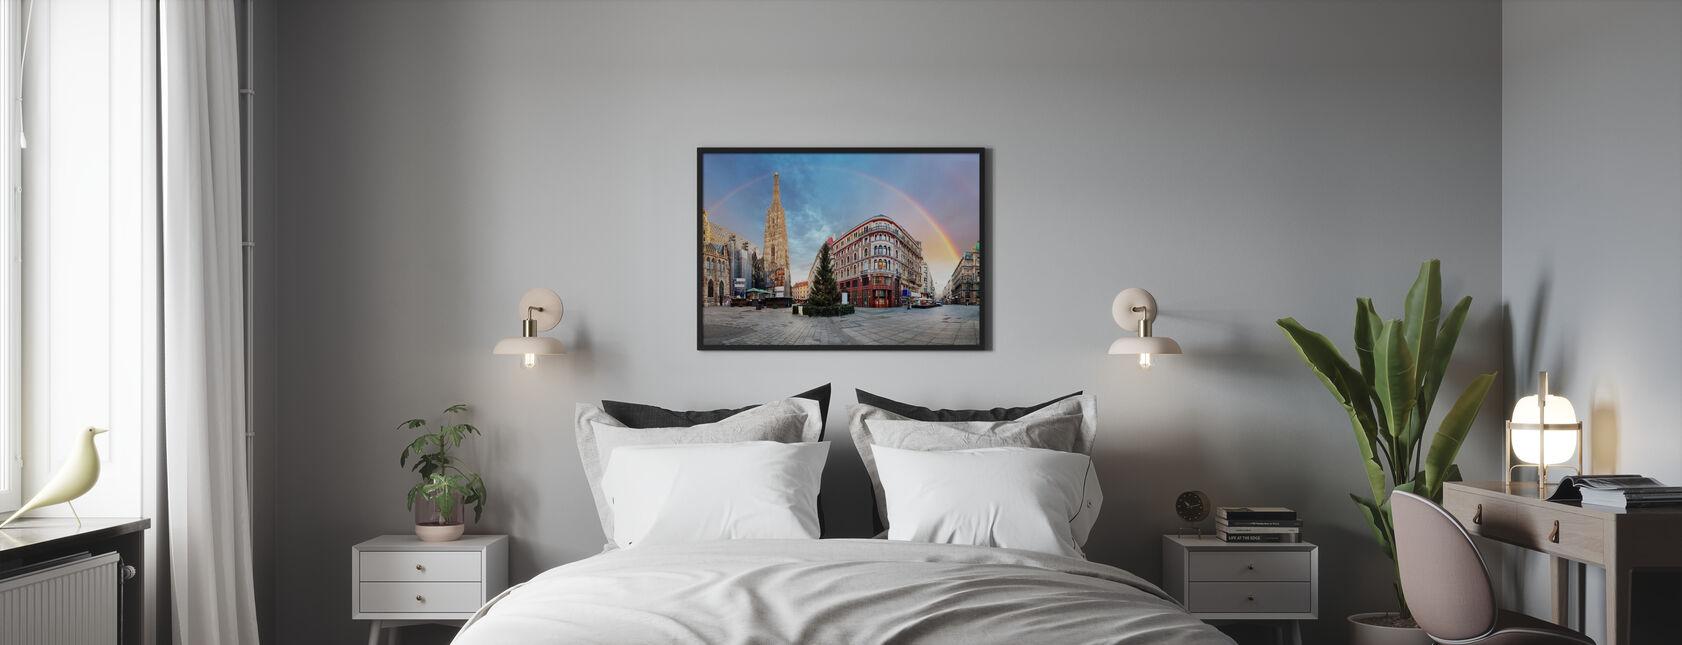 Wiener-pladsen med regnbue - Plakat - Soveværelse